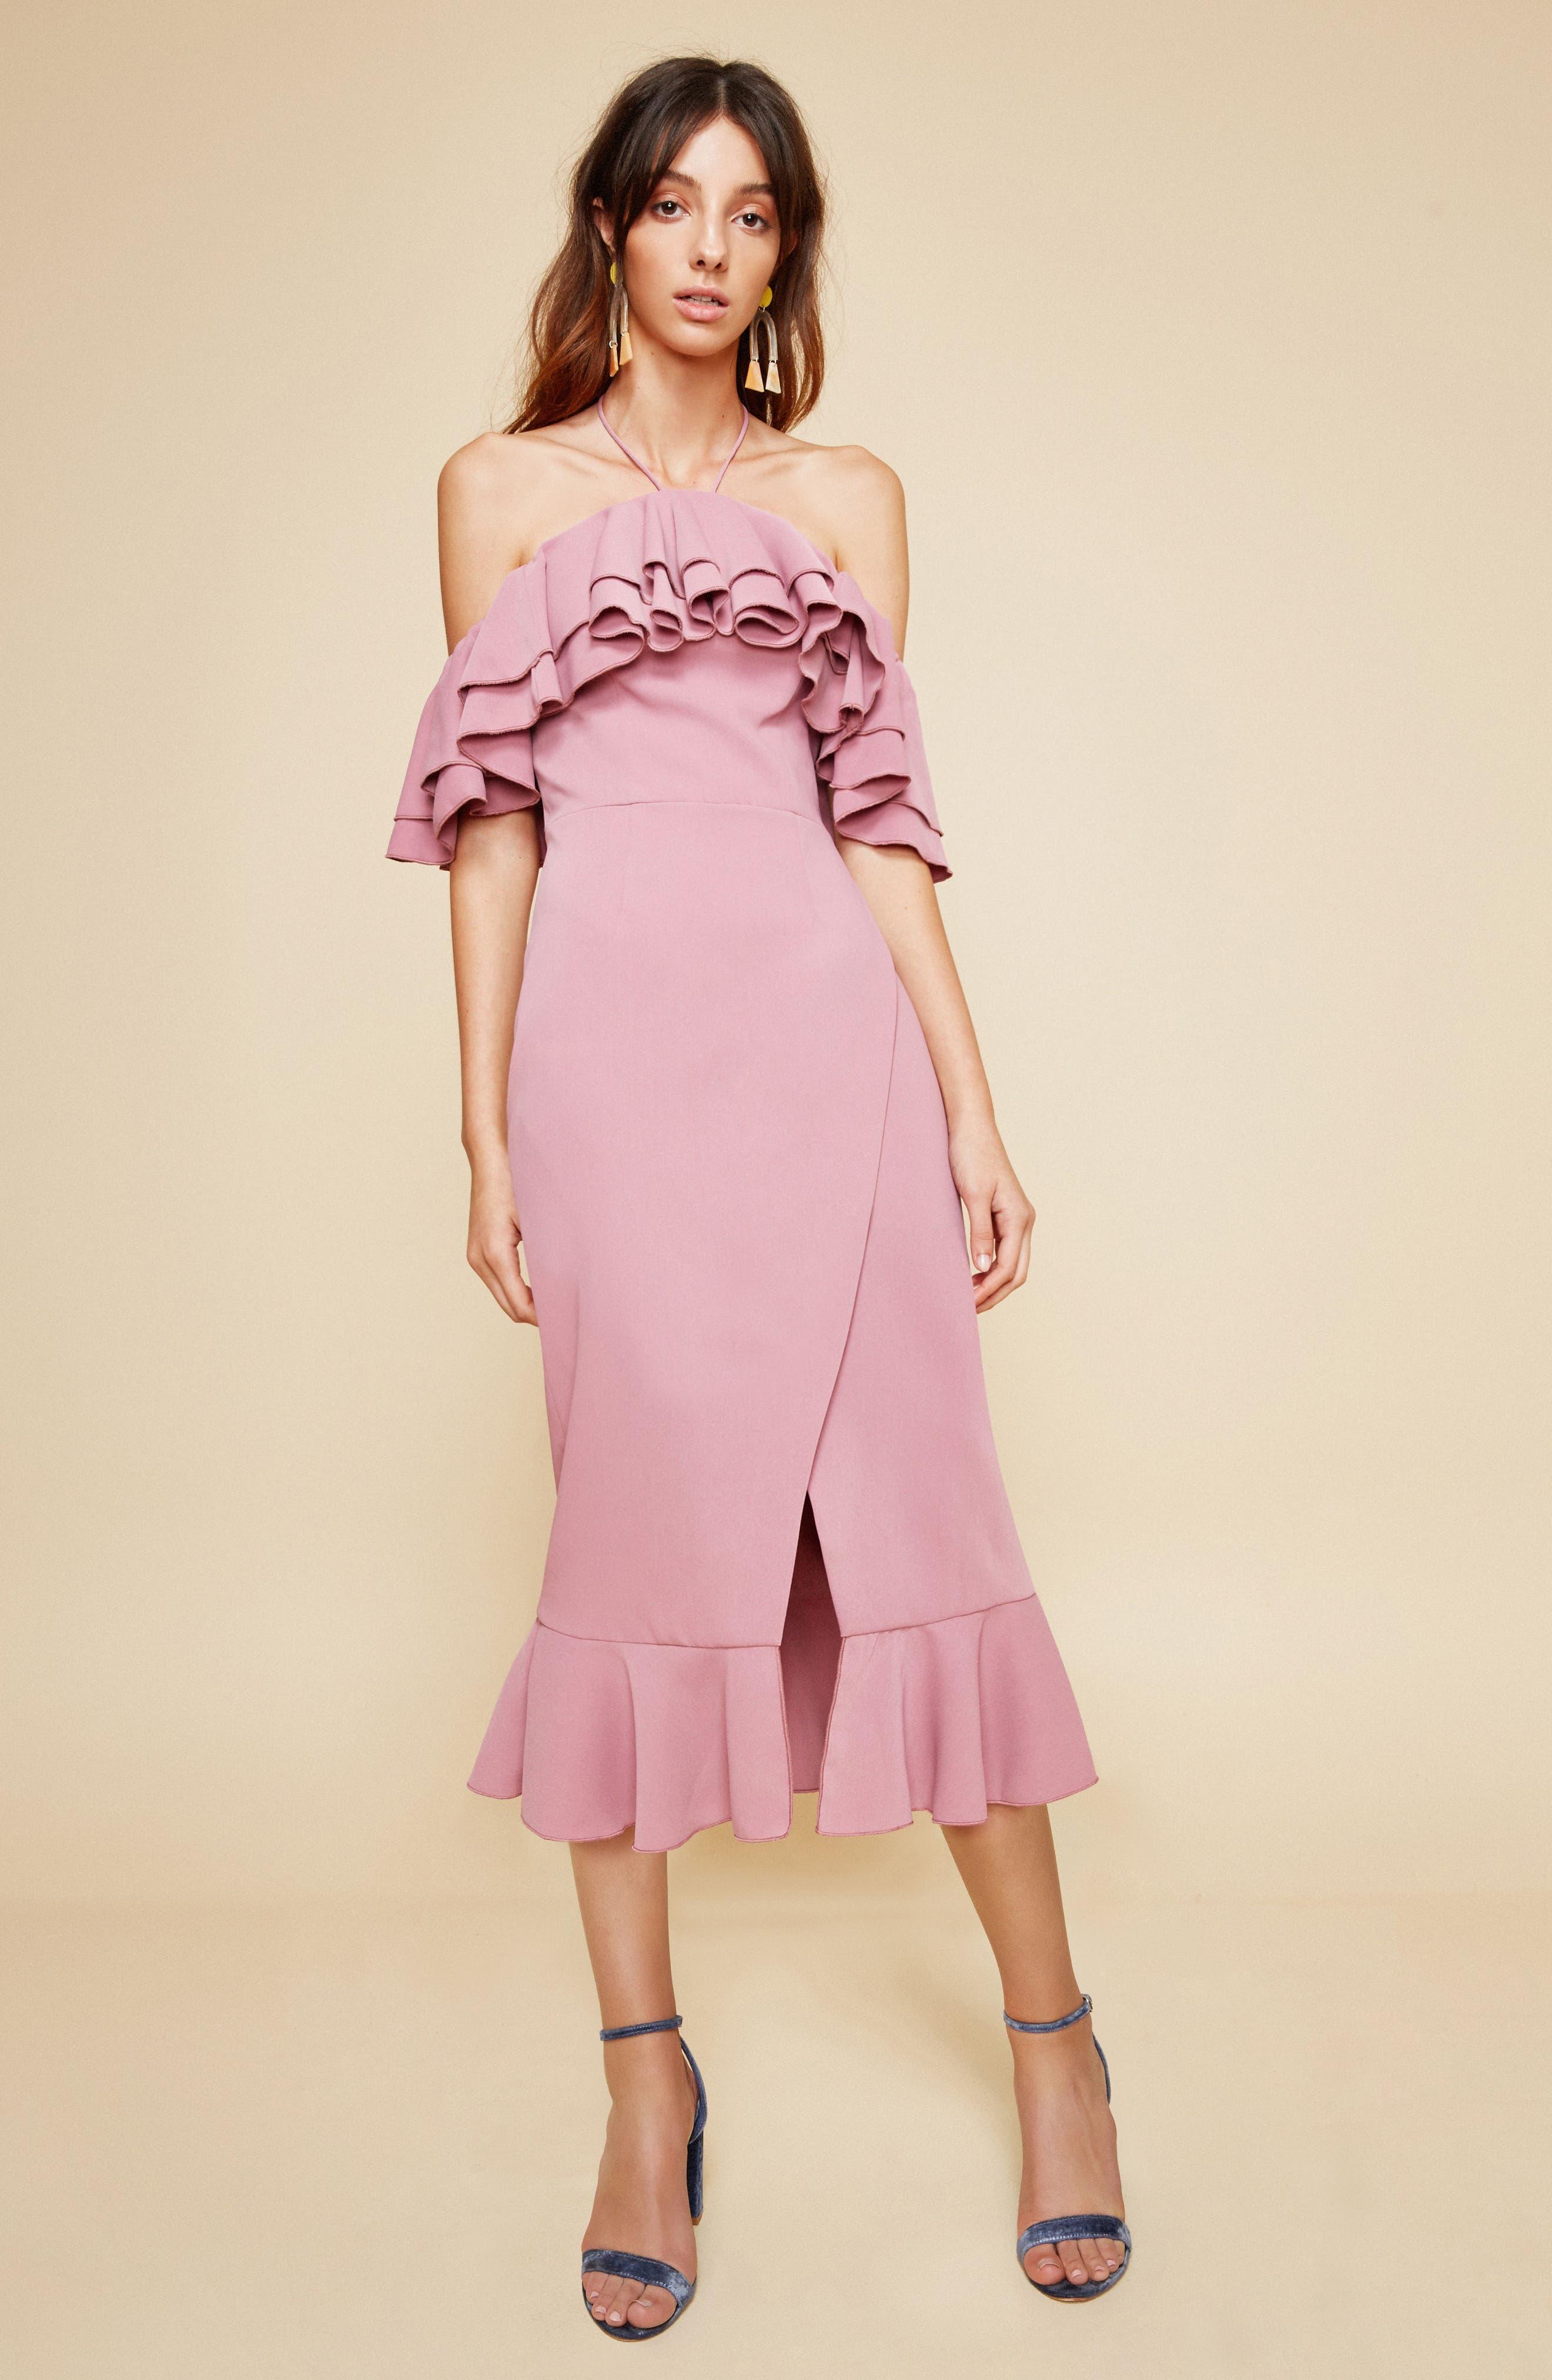 Temptation Ruffle Cold Shoulder Dress,                             Alternate thumbnail 2, color,                             Mulberry